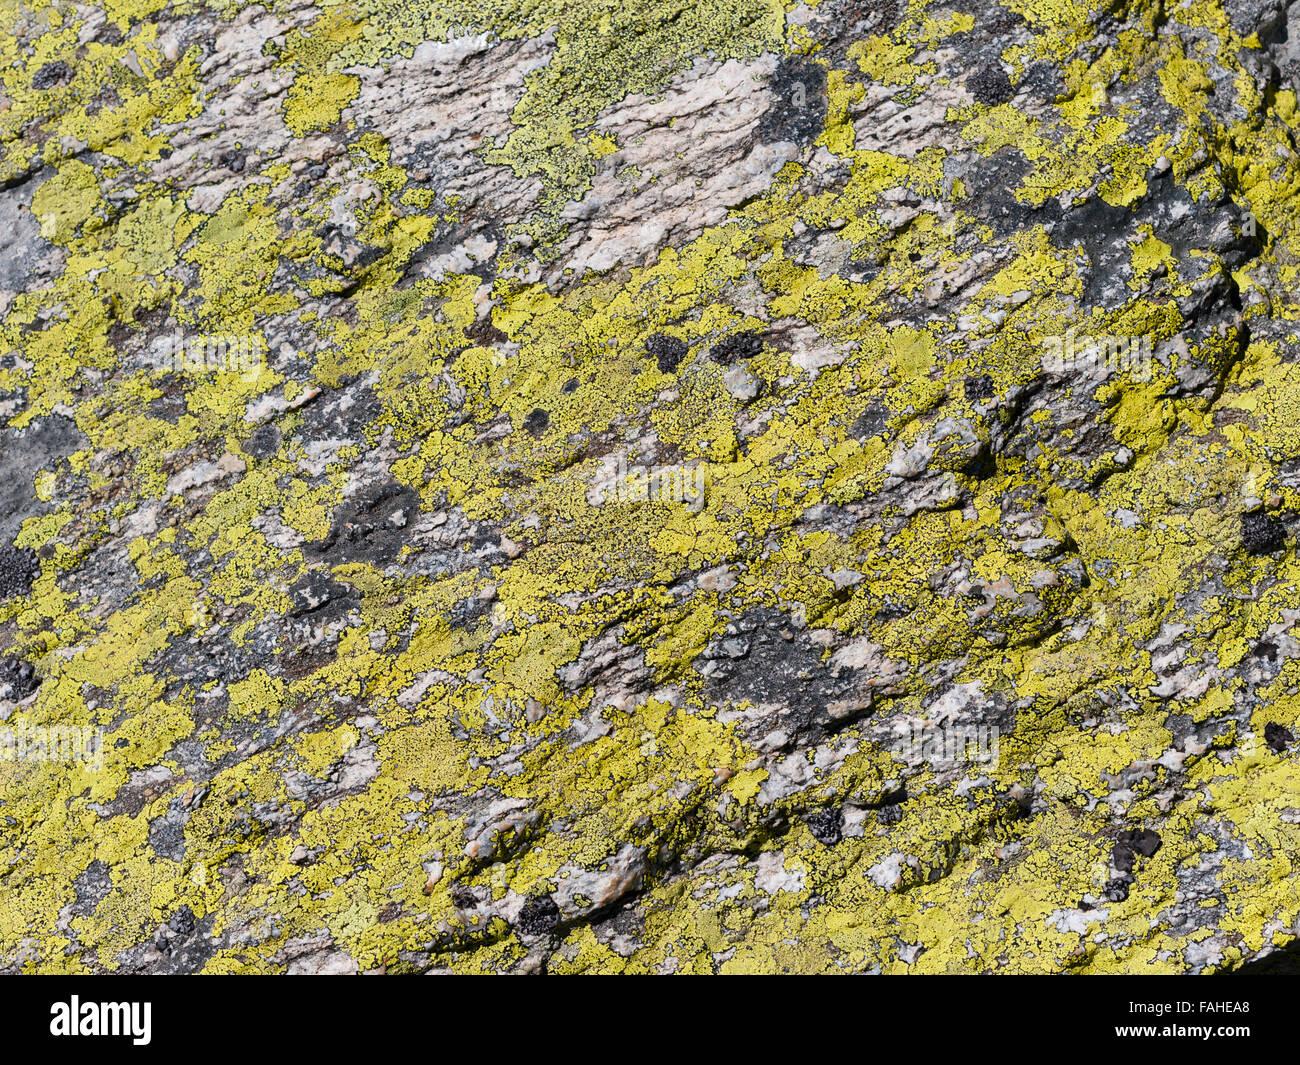 Vivid farbige Flechten auf einem Felsen Stockbild